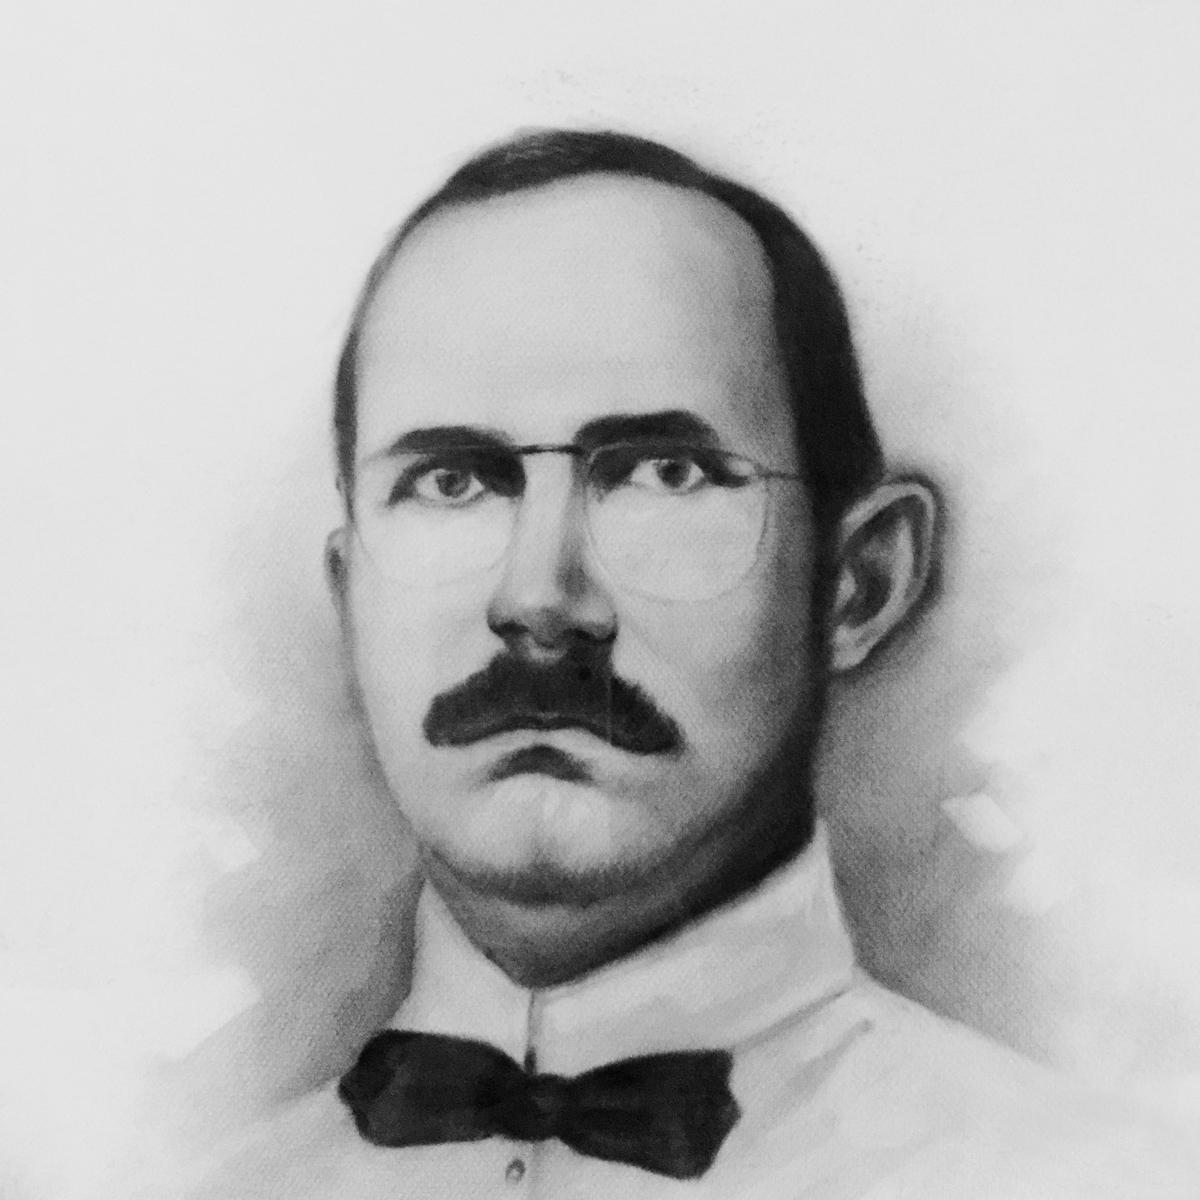 Martin M. Levering